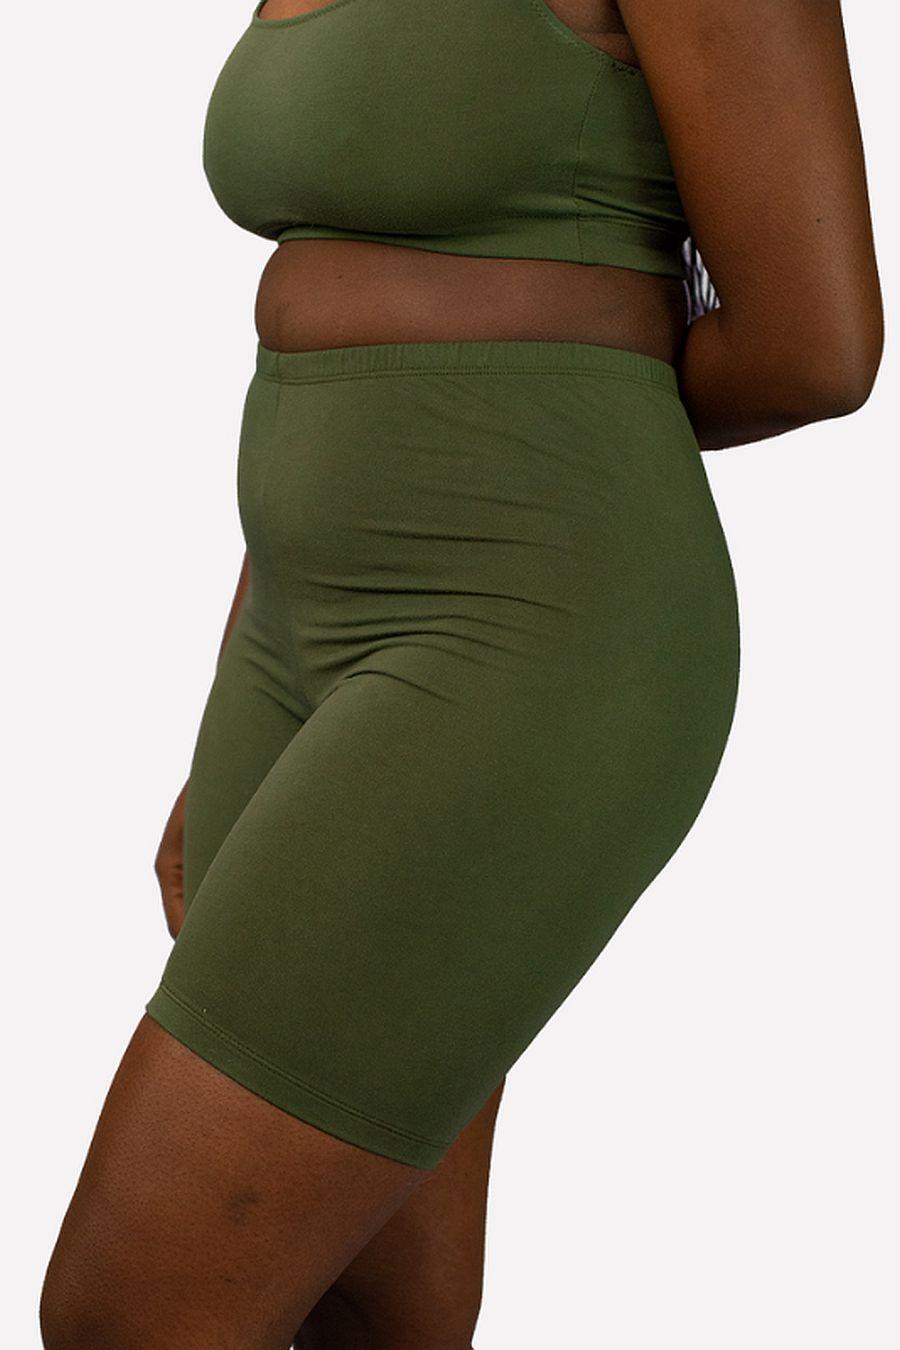 Hara The Label Olive Gabi Bike Shorts